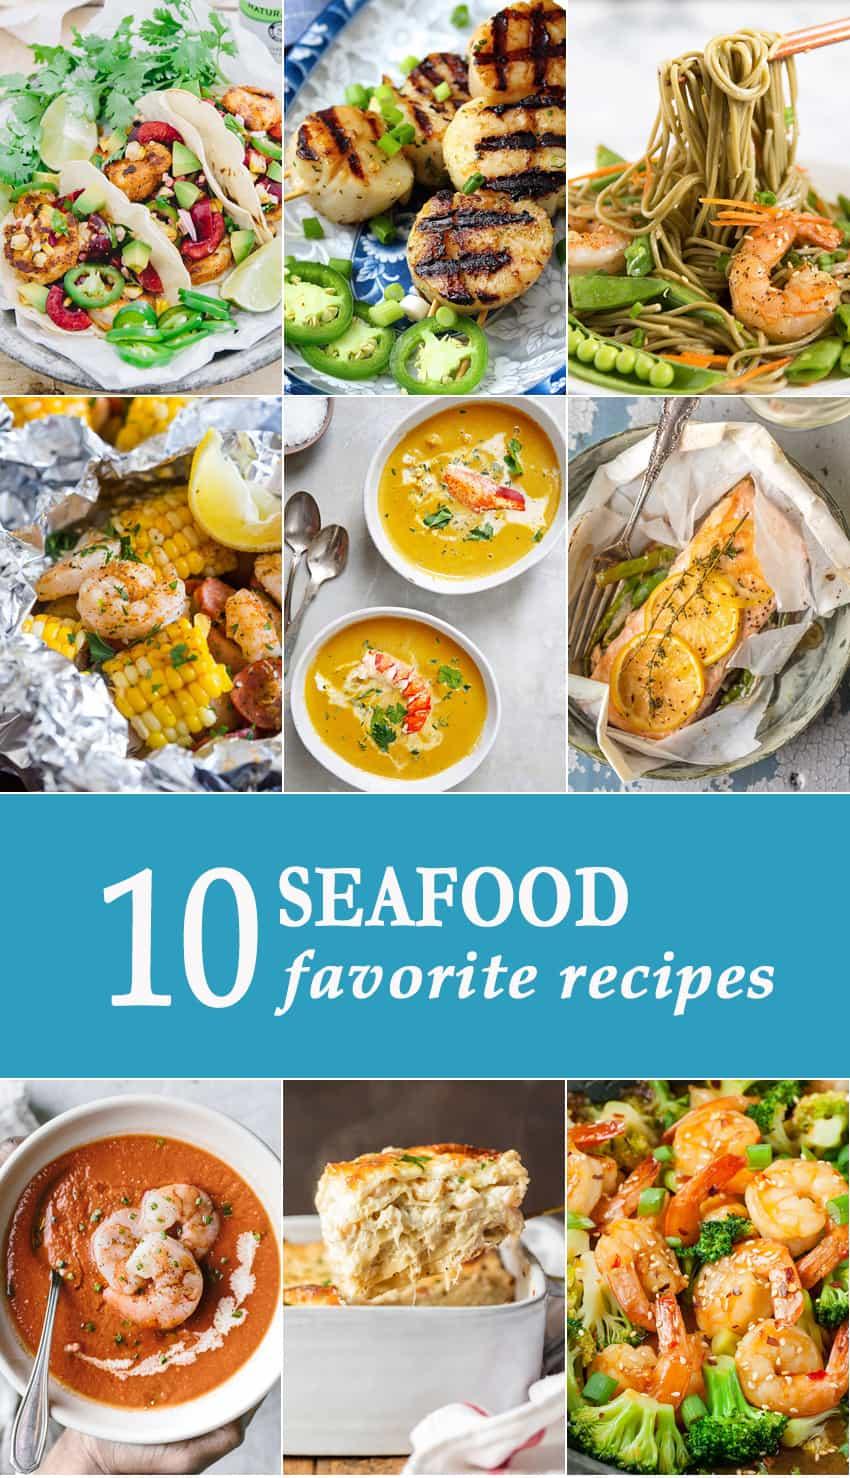 10 Seafood Favorite Recipes